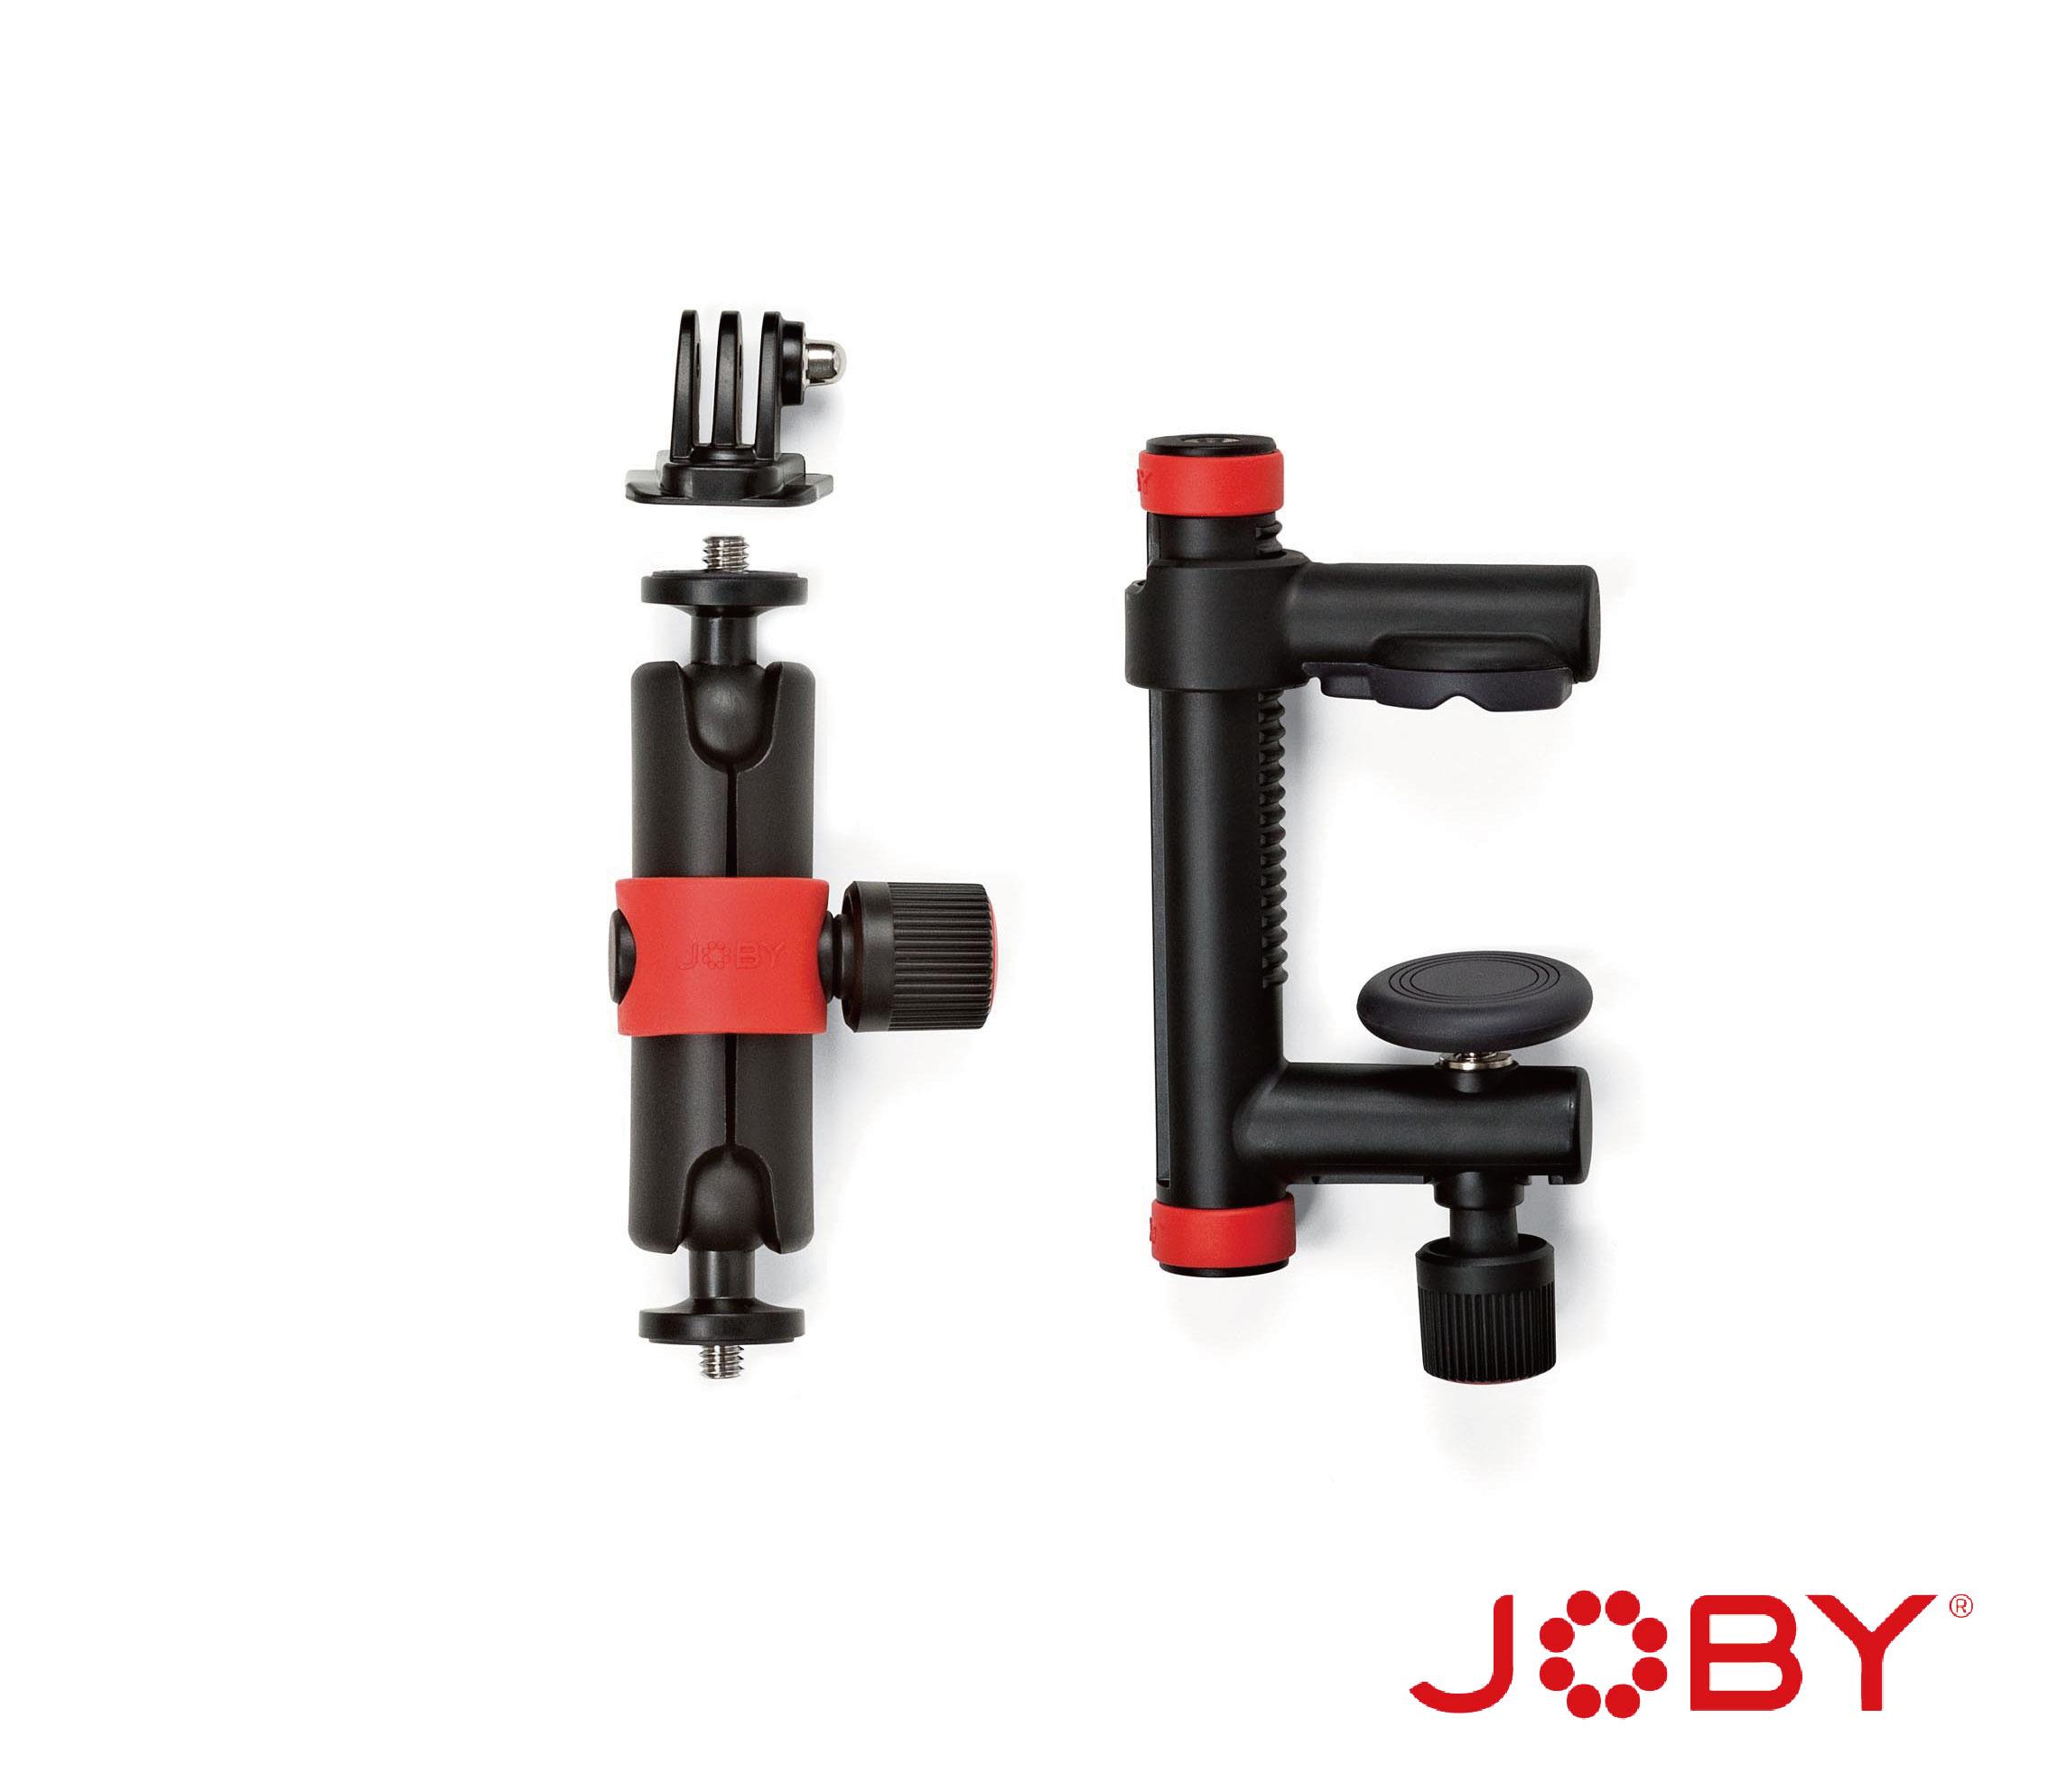 JOBY Action Clamp & Locking Arm 強力攝影鎖臂夾具 #JB01291 ( JB29 )